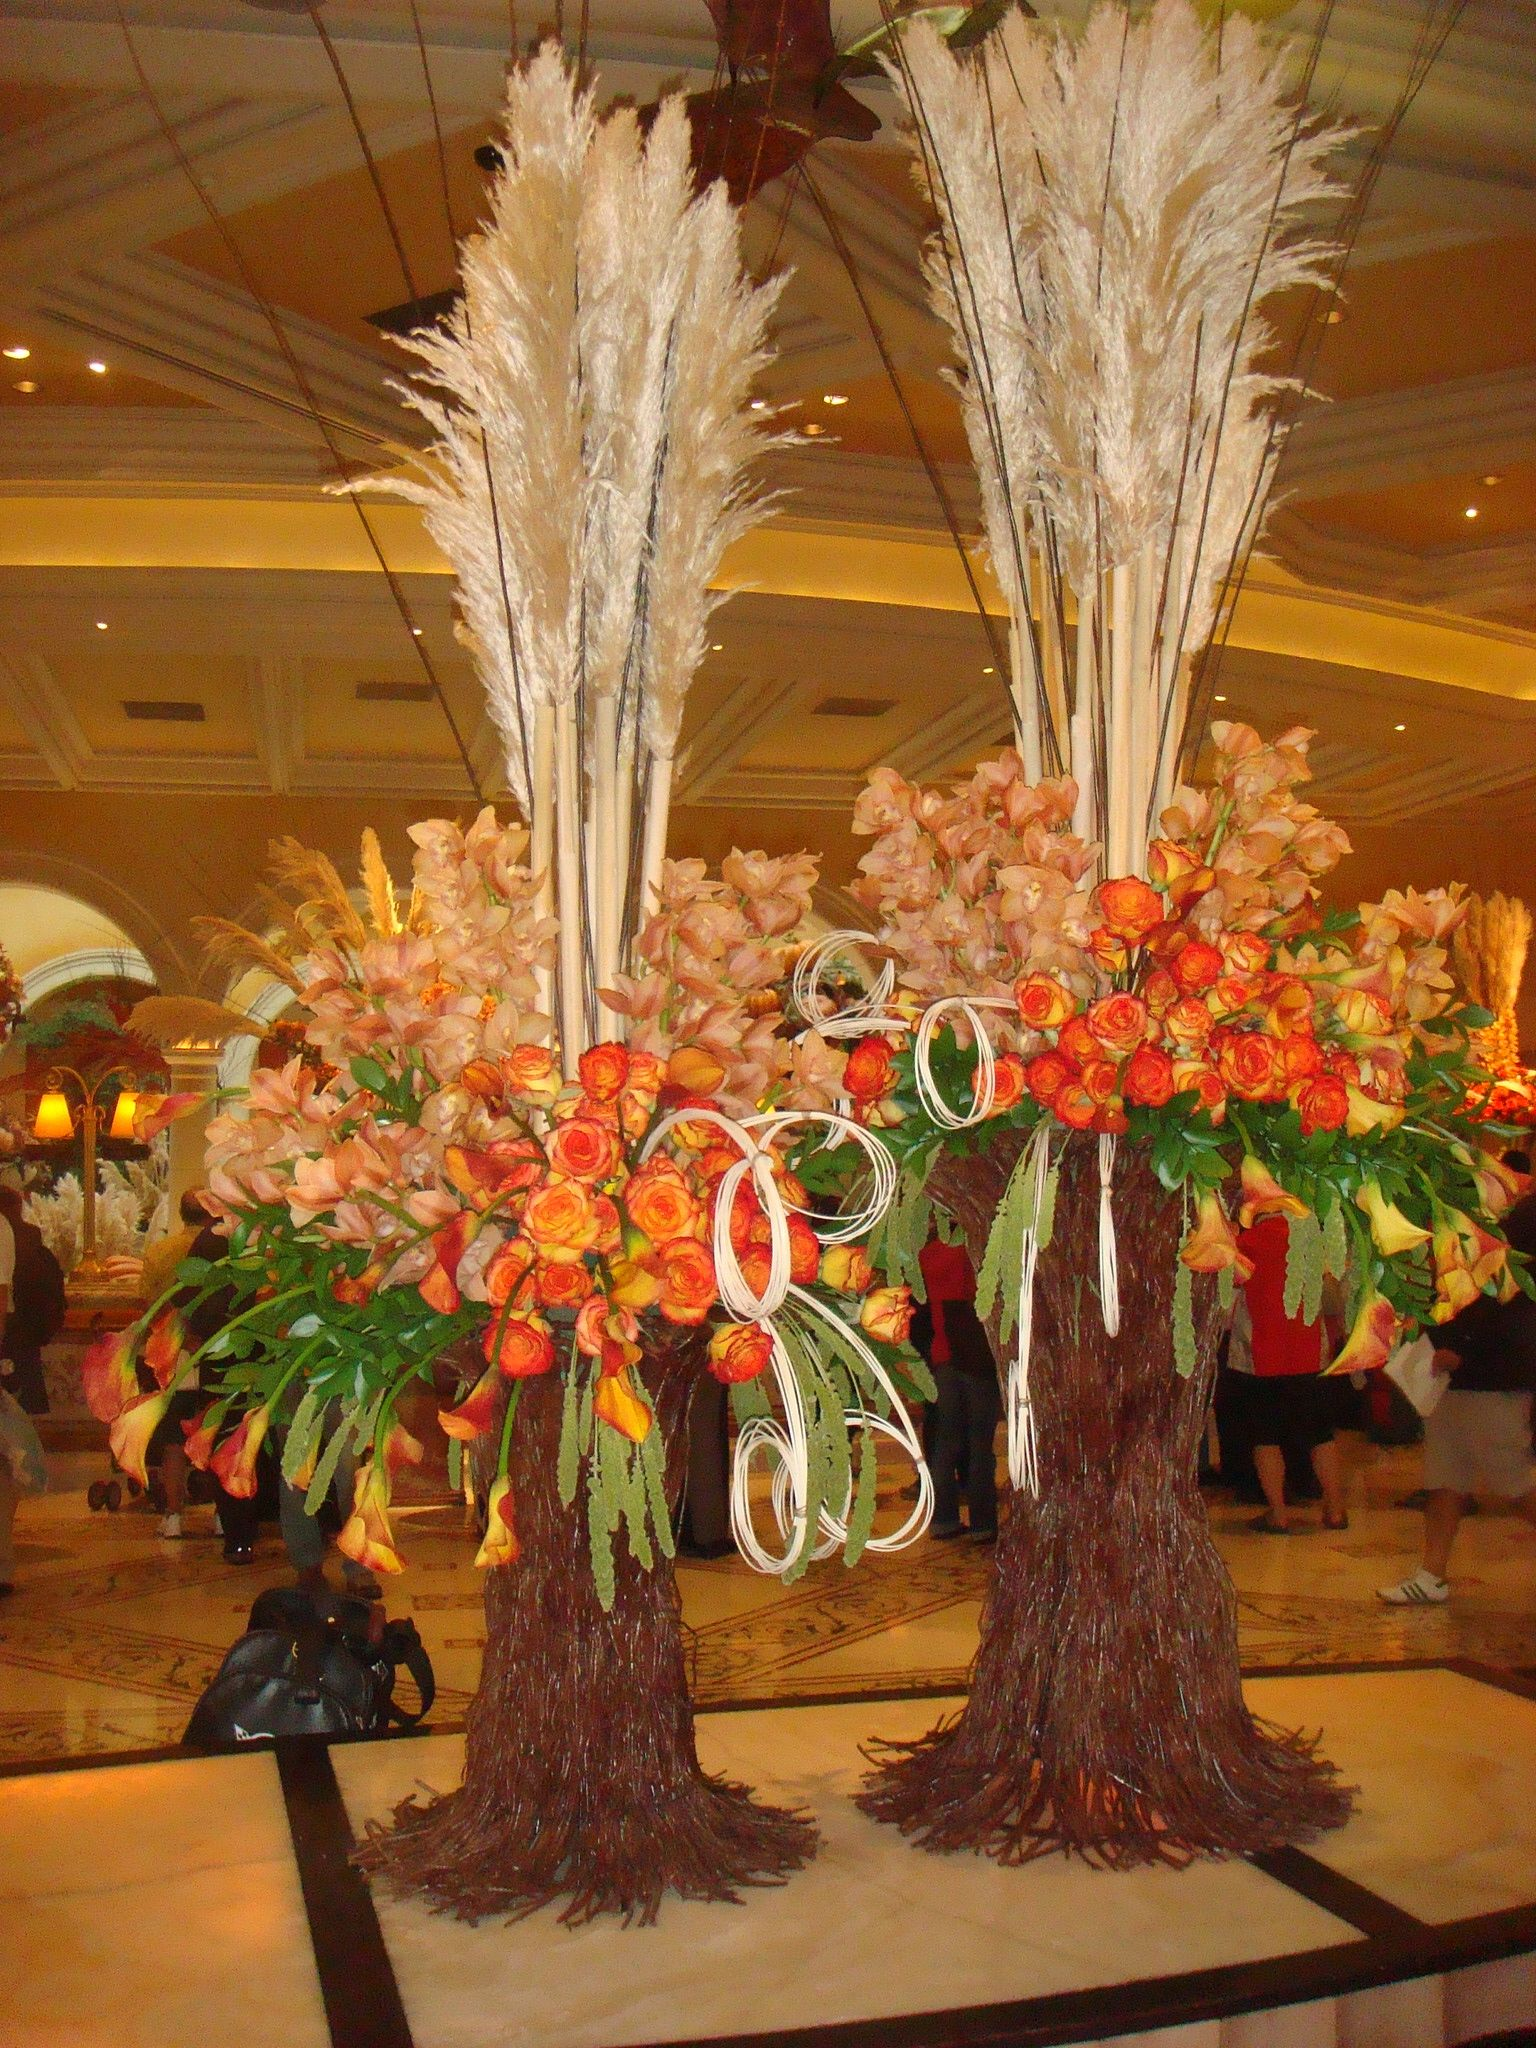 most beautiful flower arrangements | Design Tips, Floral Arrangements. October 16, 2012. A creative way for ...